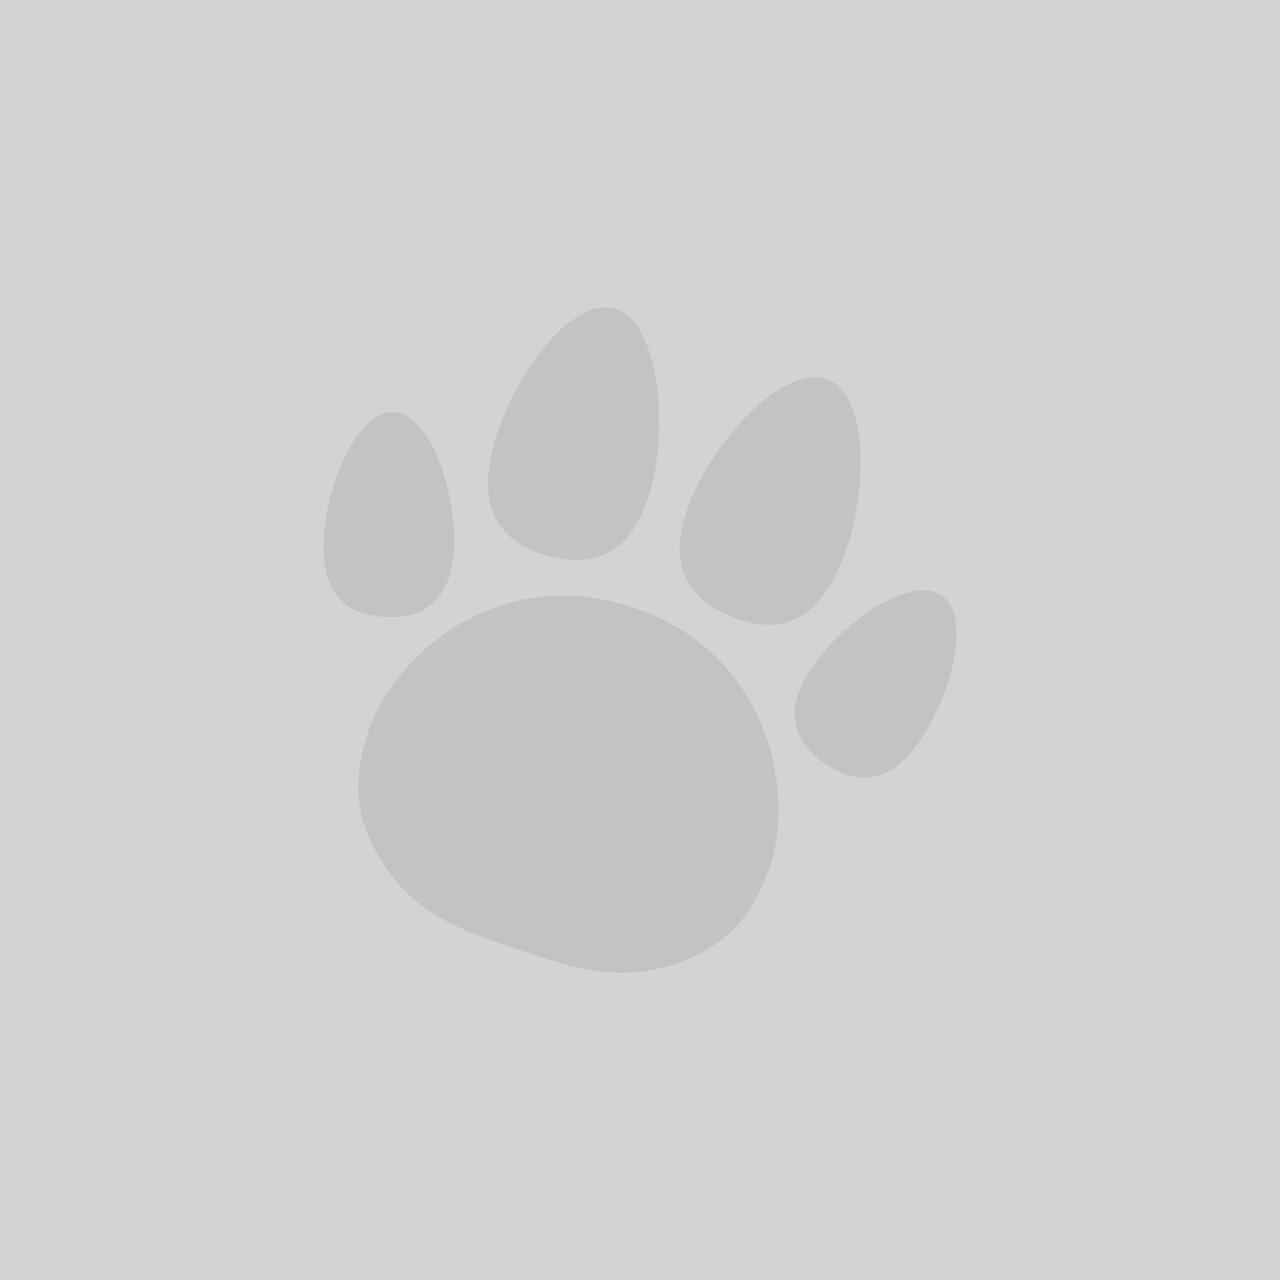 House of Paws Pheasant Vinyl Ball Head Dog Toy